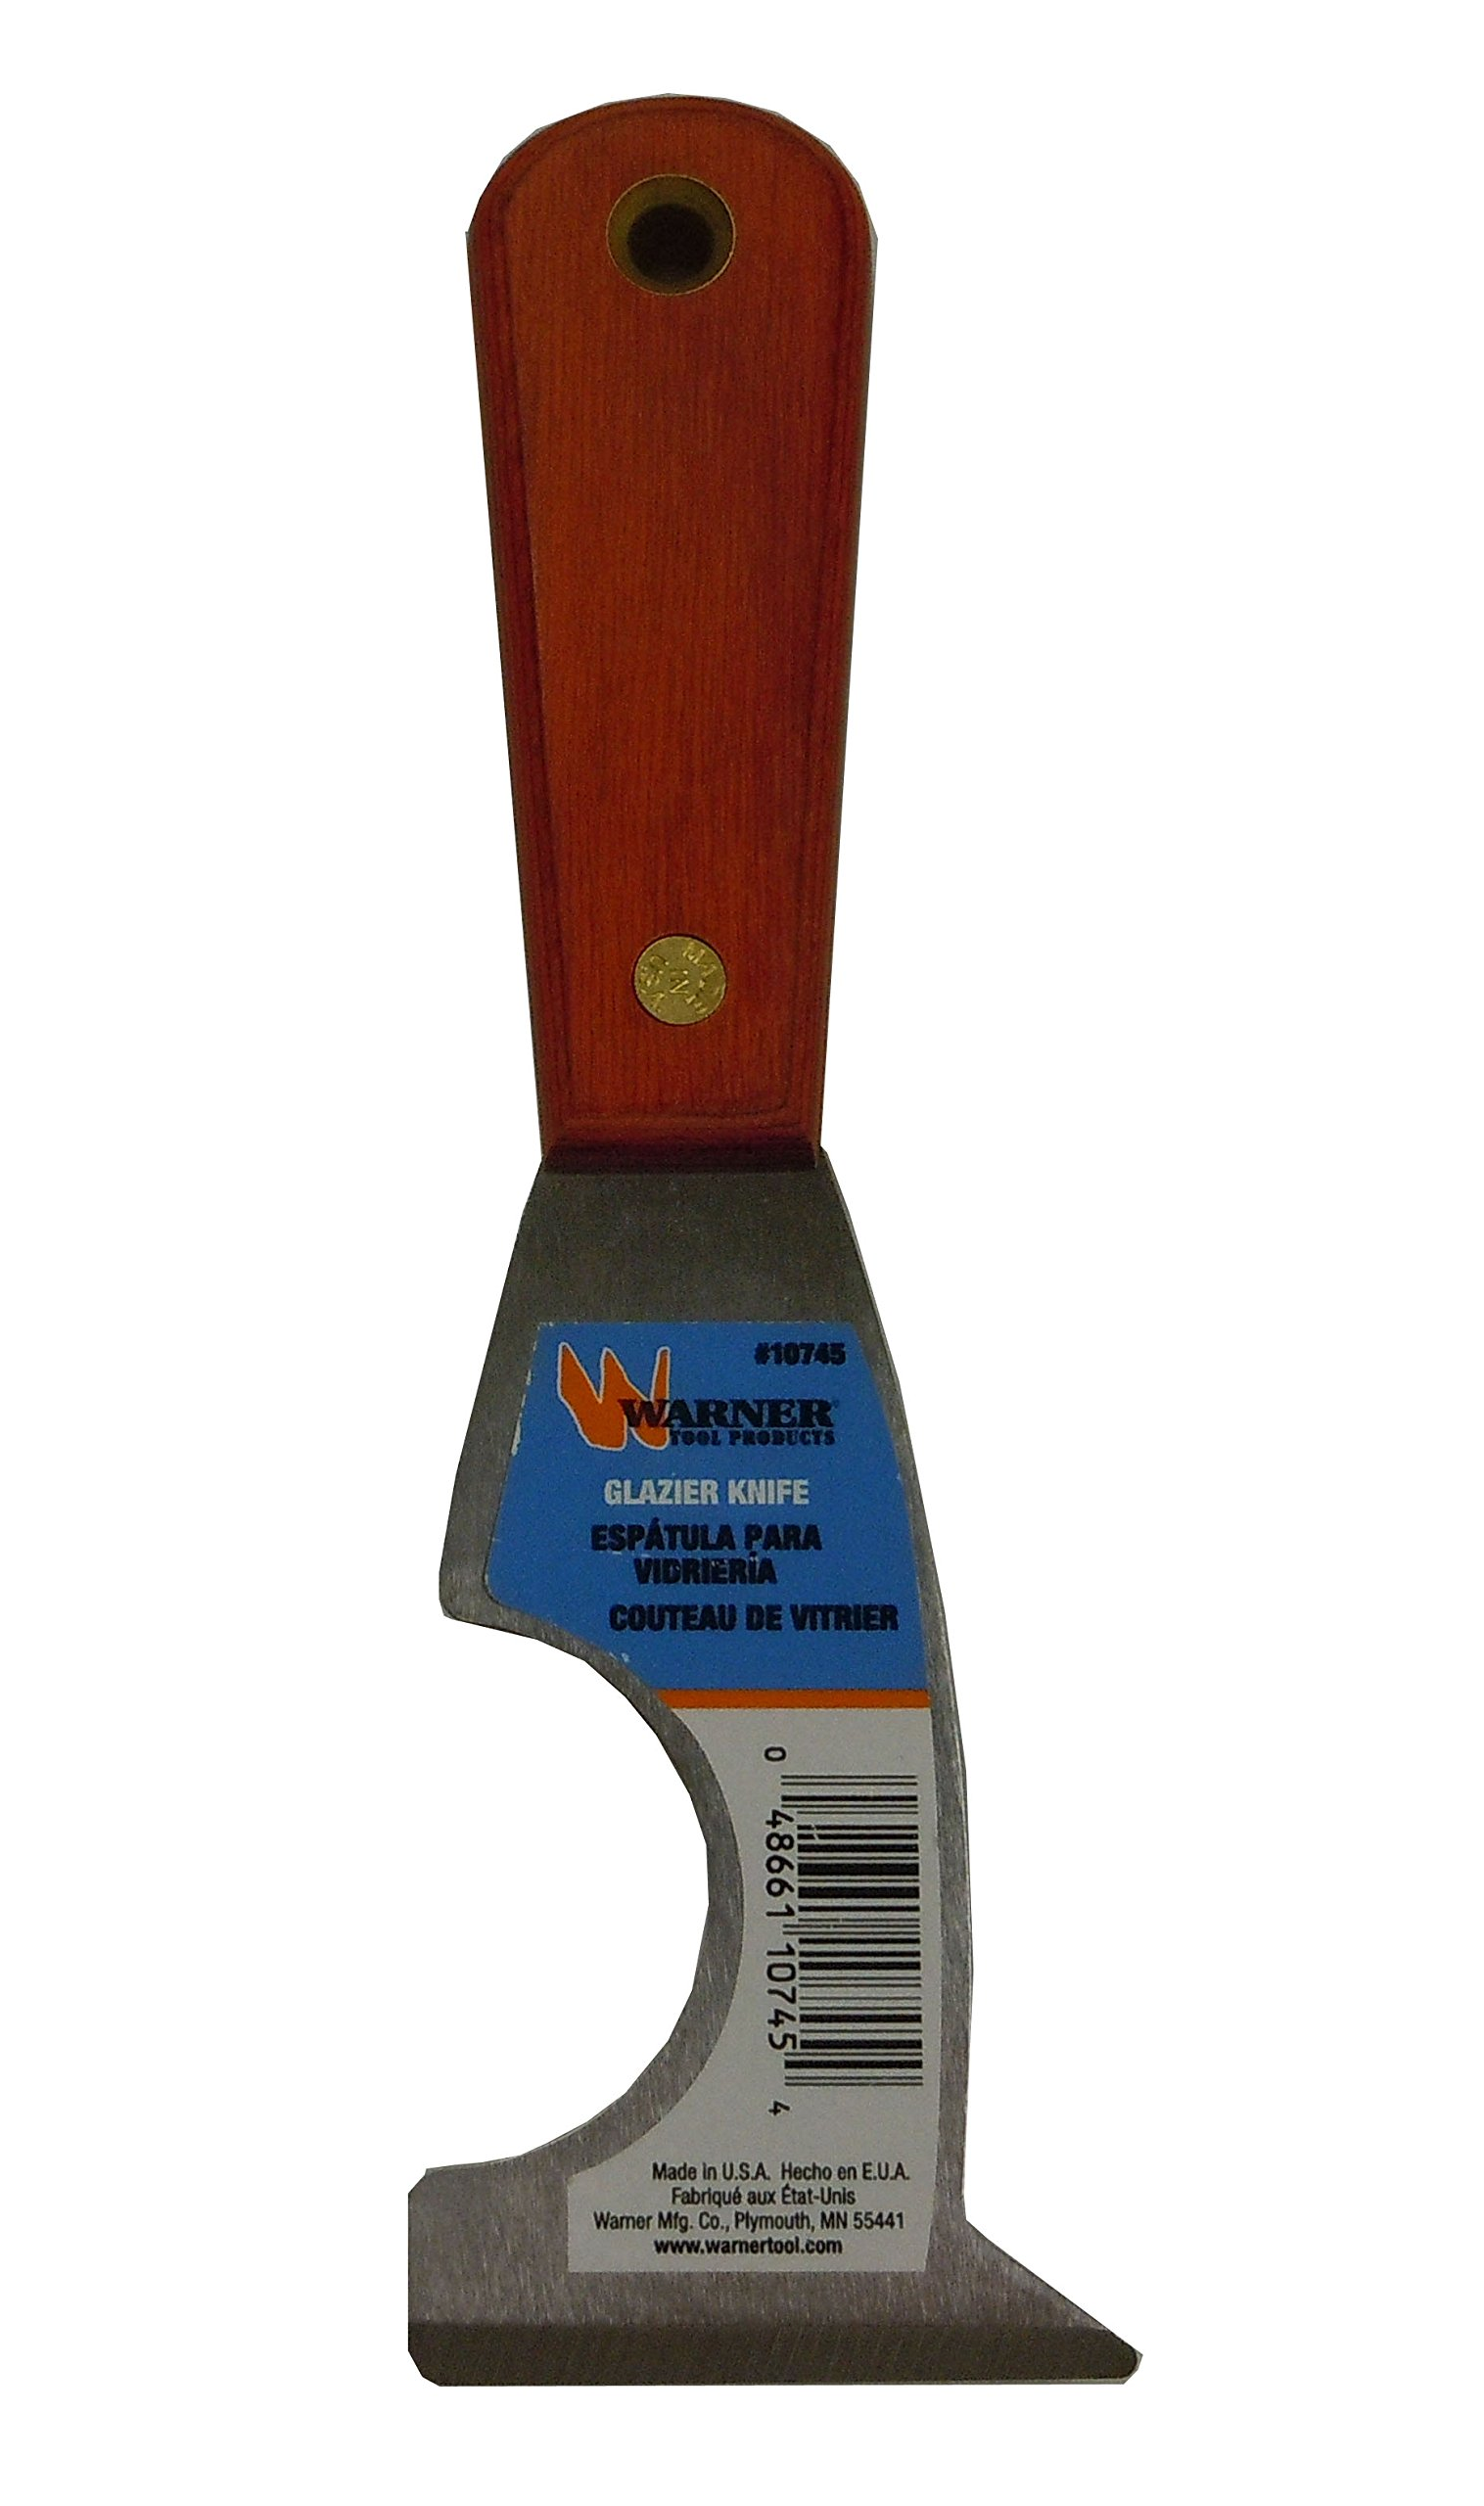 Warner 5-in-1 Stiff Glazier Knife, Stainless Steel Blade, Rosewood Series, 10745